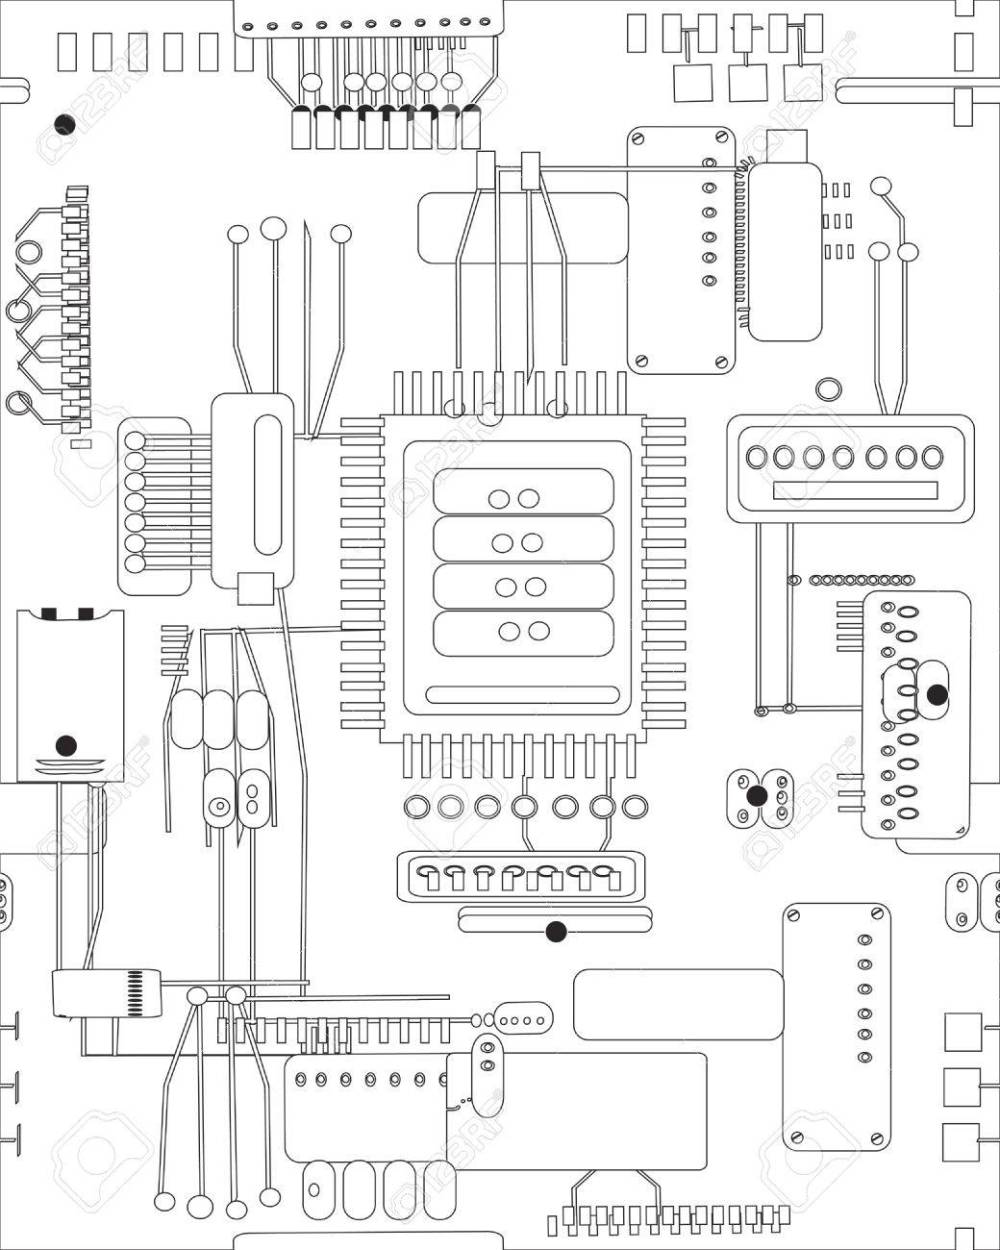 medium resolution of  beautiful spa circuit board wiring diagram model electrical attractive spa circuit board wiring diagram picture collection